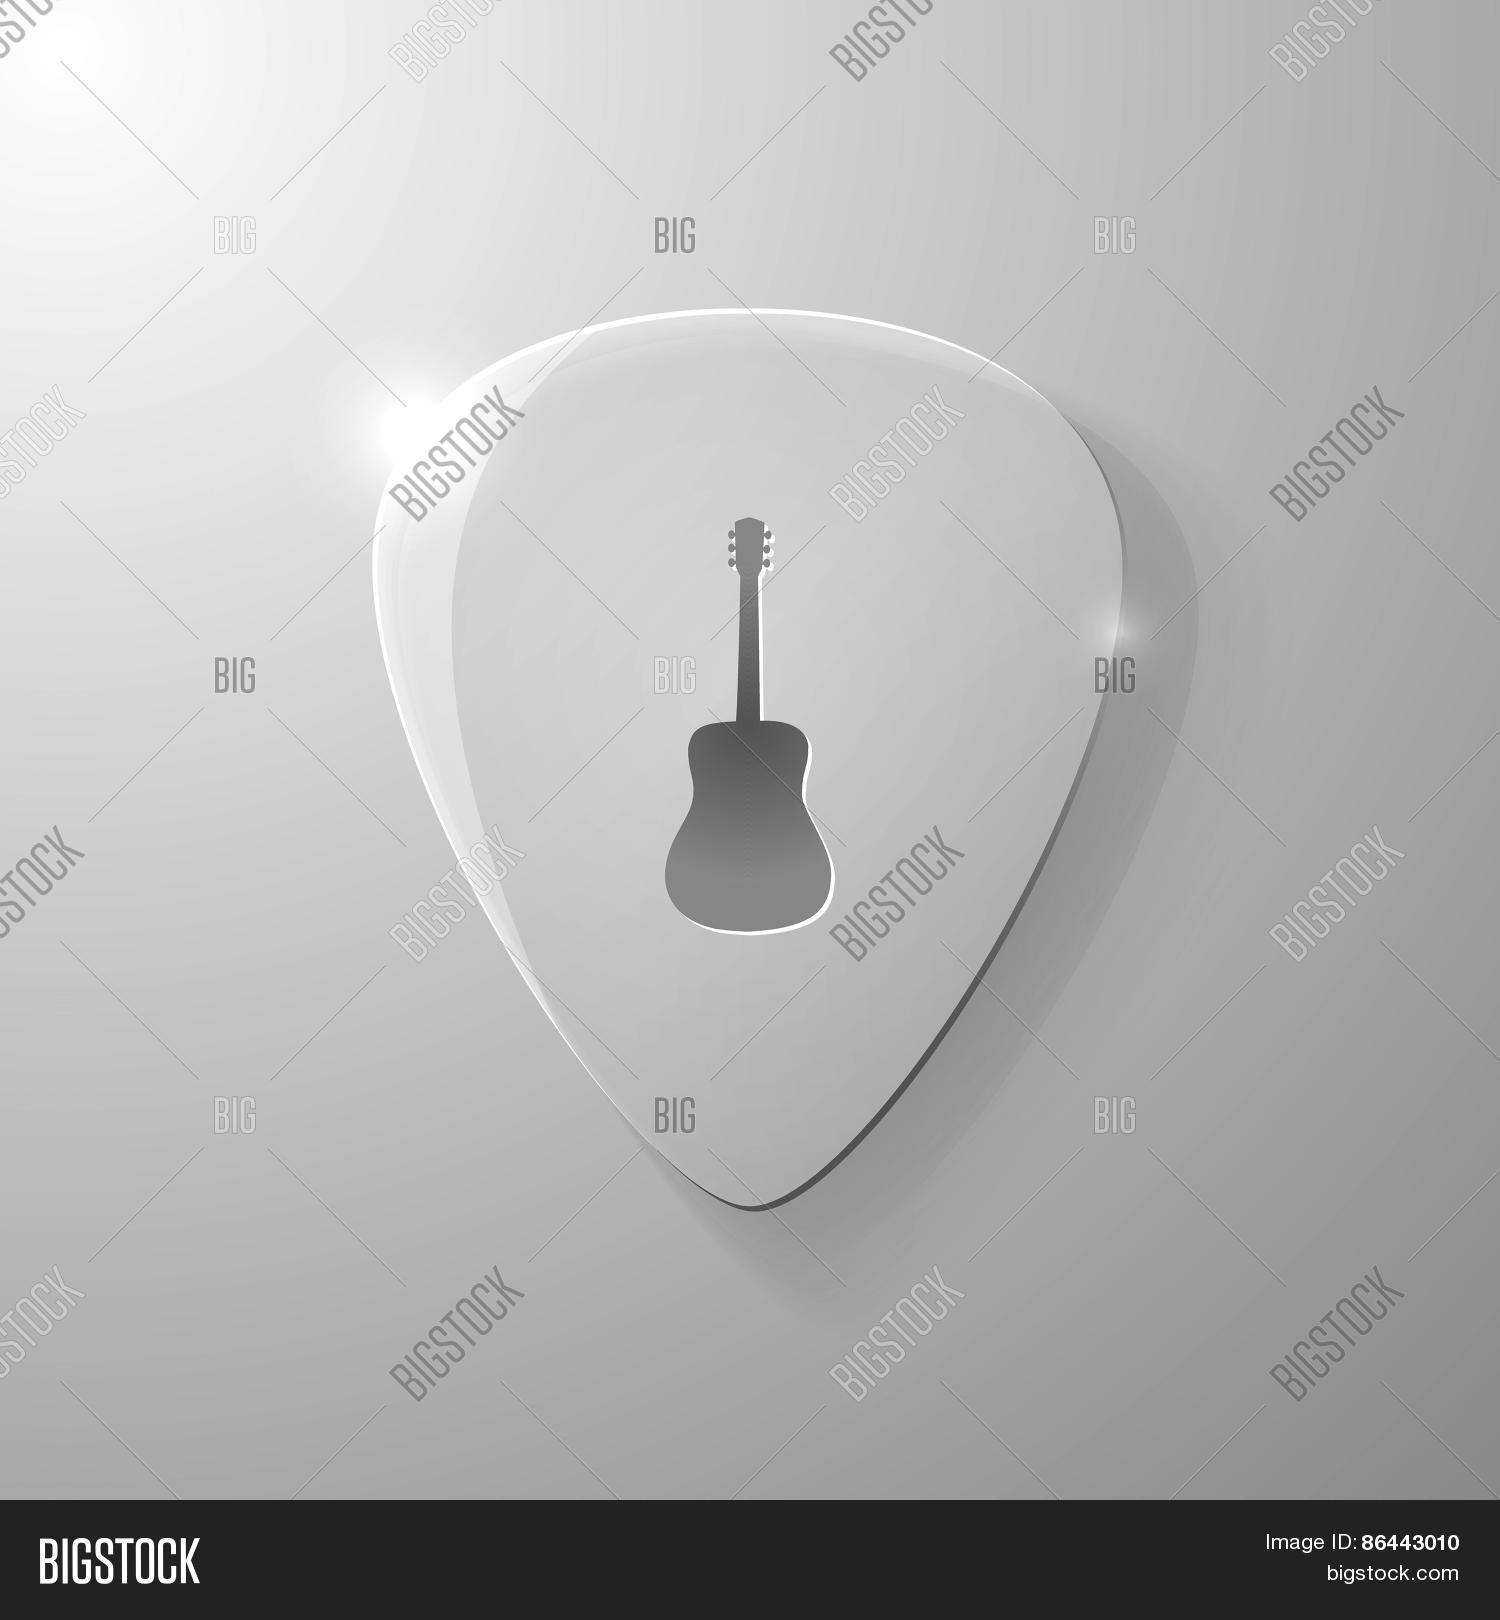 guitar wallpaper behind glass - photo #19